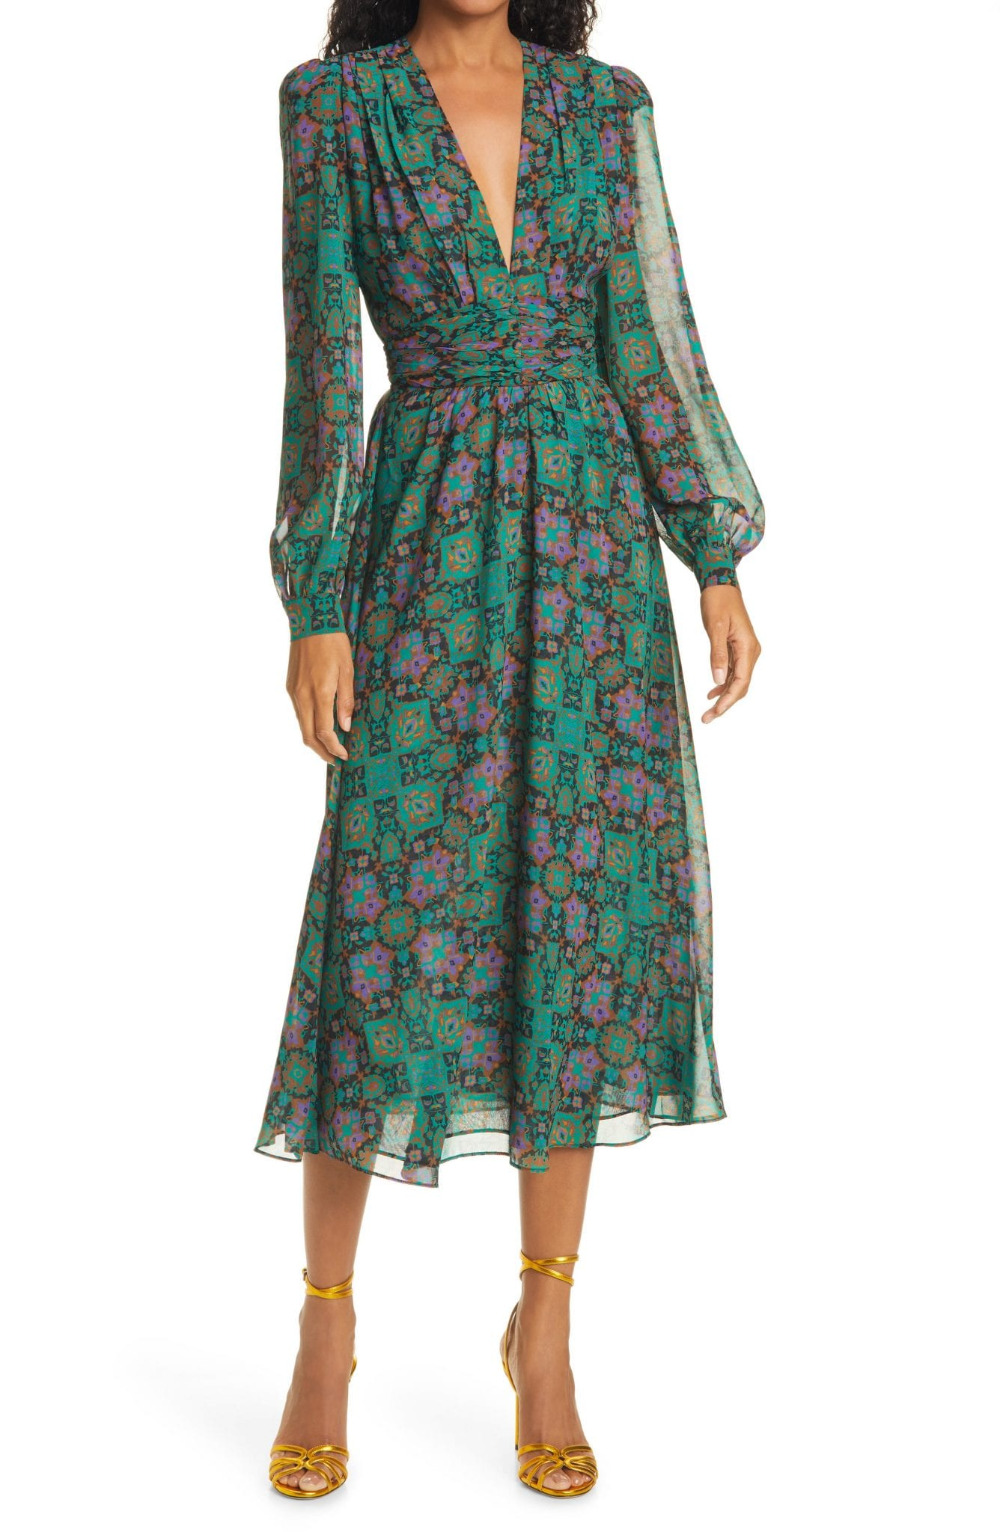 Ronny Kobo Tula Print Plunge Neck Long Sleeve Midi Dress We Select Dresses Long Sleeve Wrap Midi Dress Womens Trendy Dresses Long Sleeve Midi Dress [ 1532 x 1000 Pixel ]